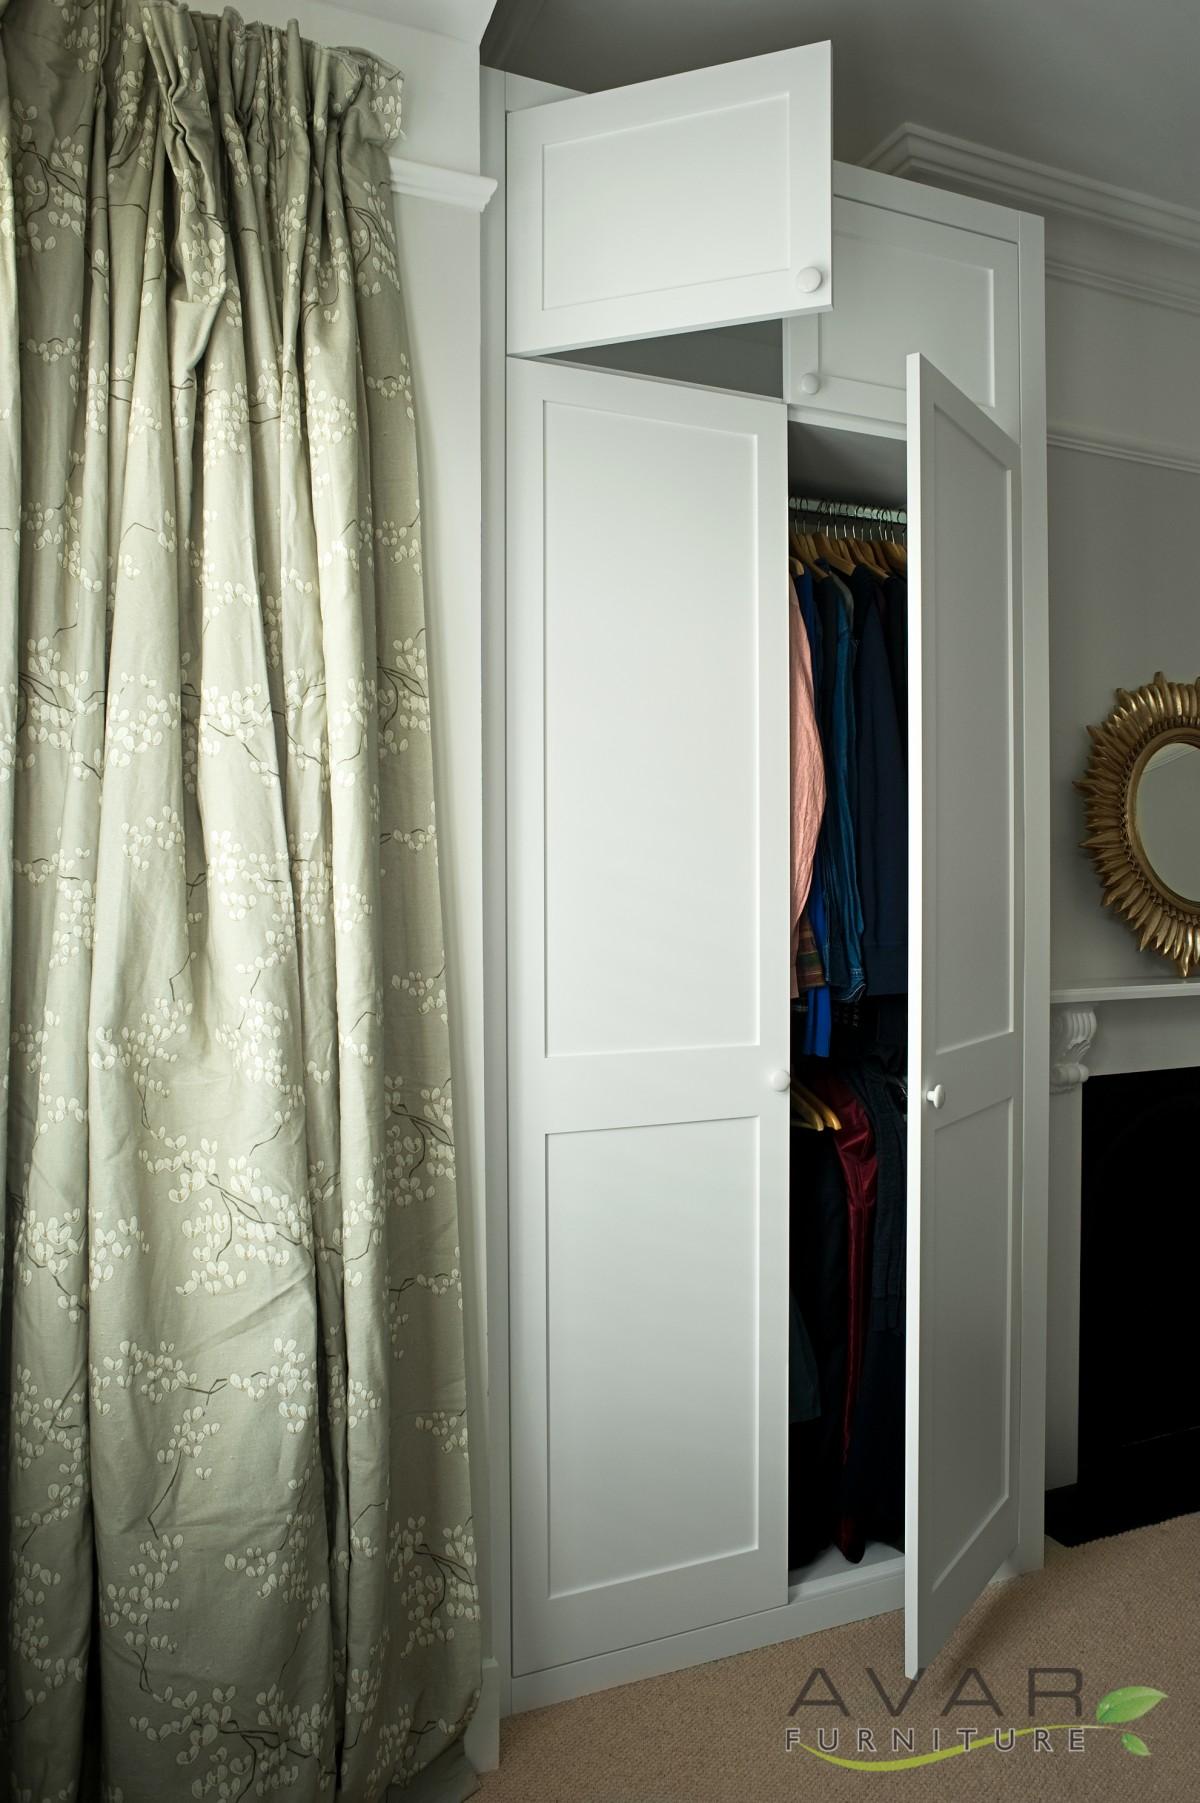 Fitted wardrobe ideas gallery 3 north london uk avar furniture - Fitted Wardrobe Ideas Gallery 34 North London Uk